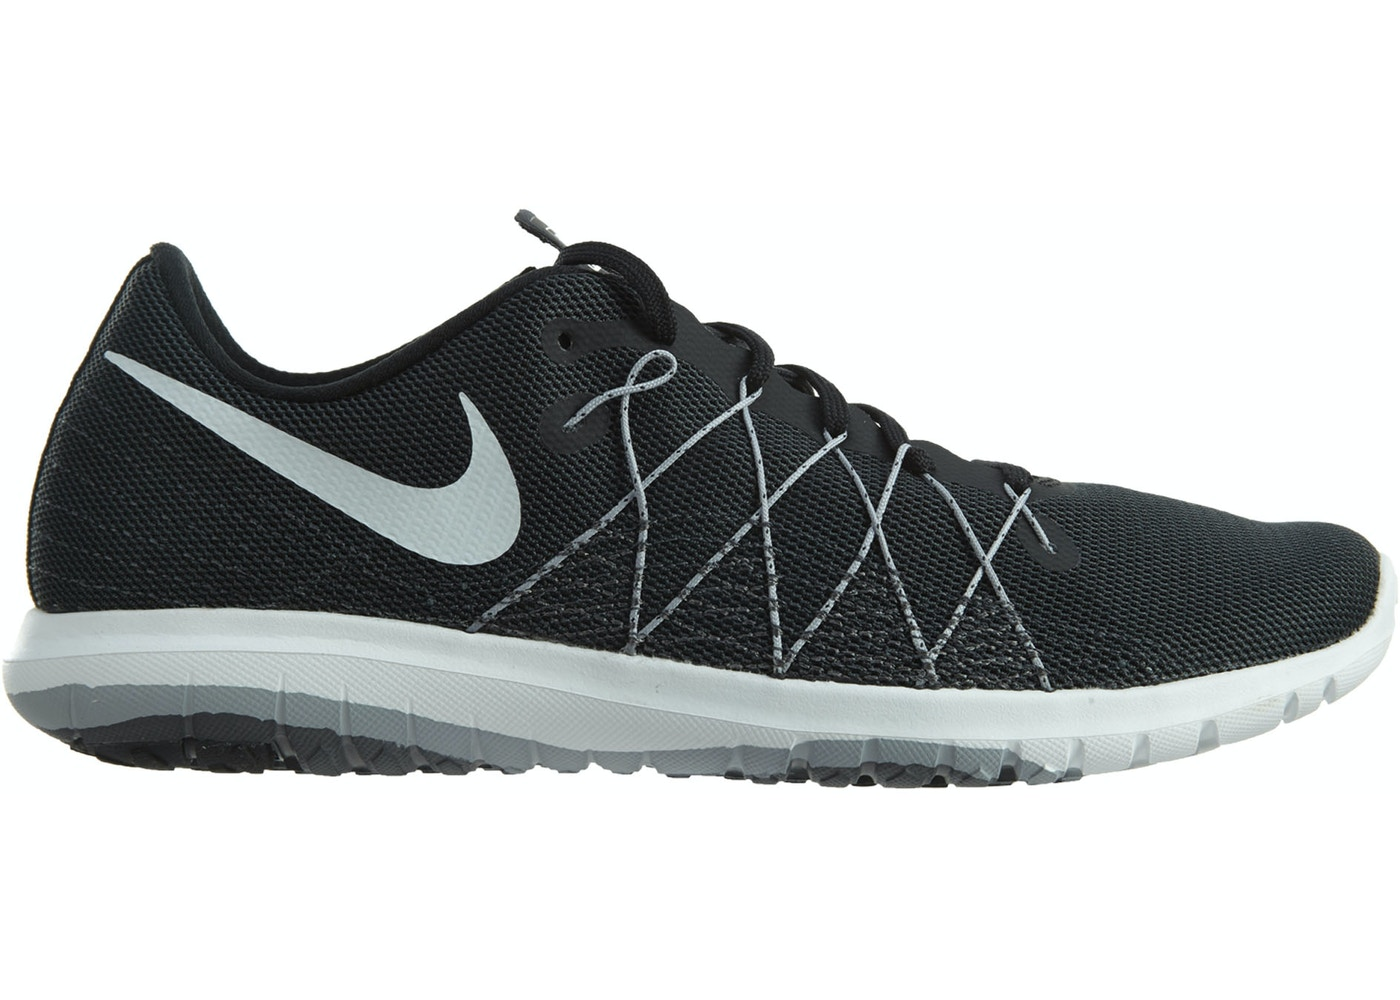 6d74af62f3ee Sell. or Ask. Size --. View All Bids. Nike Flex Fury 2 Black White-Wolf Grey -Dark Grey